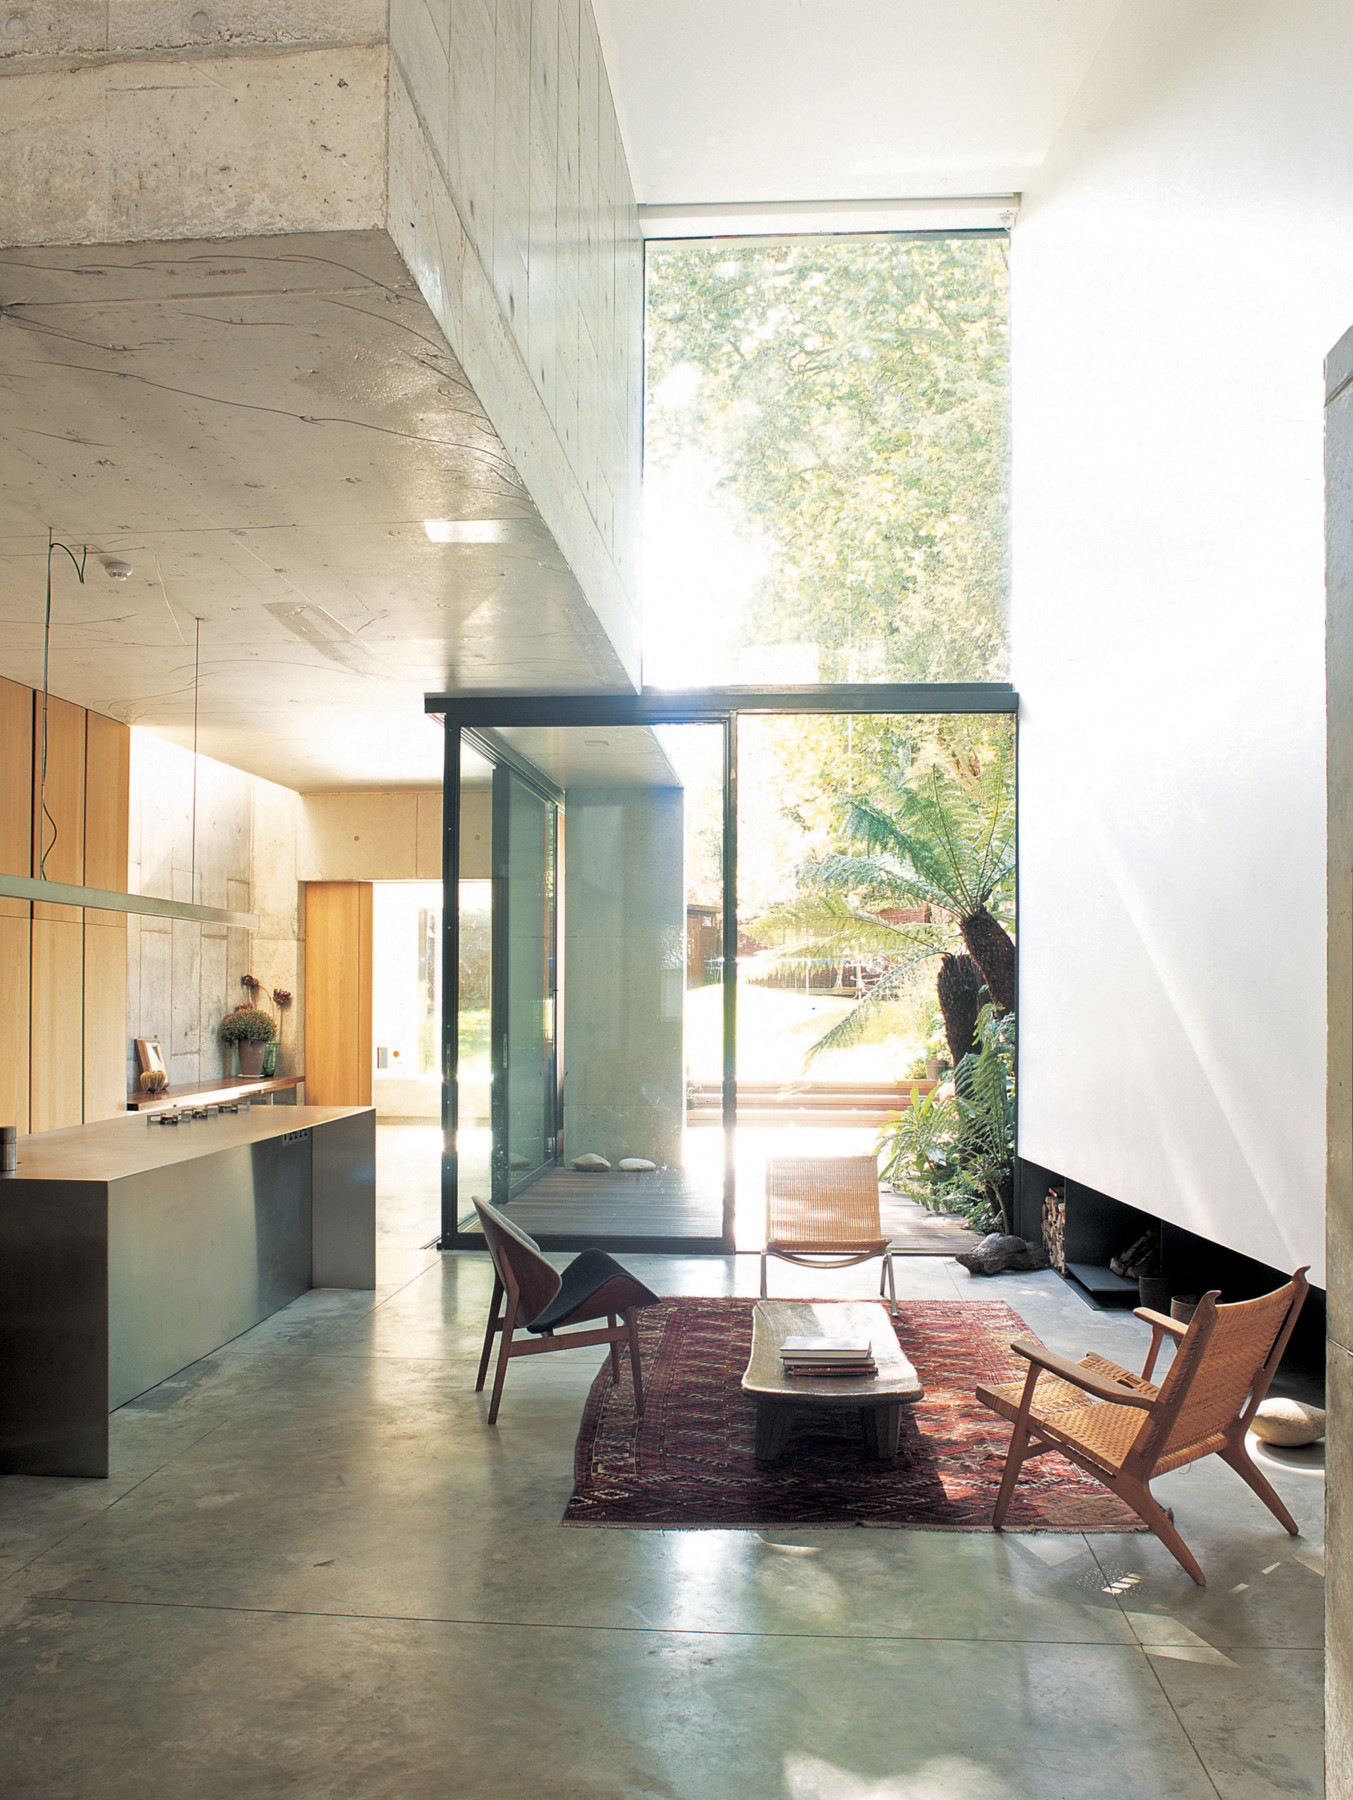 Kander-house-Primrose-hill-London-residential-home-contemporary-interior-Riba-award-victorian-Jamie-Fobert-Architects-7ret